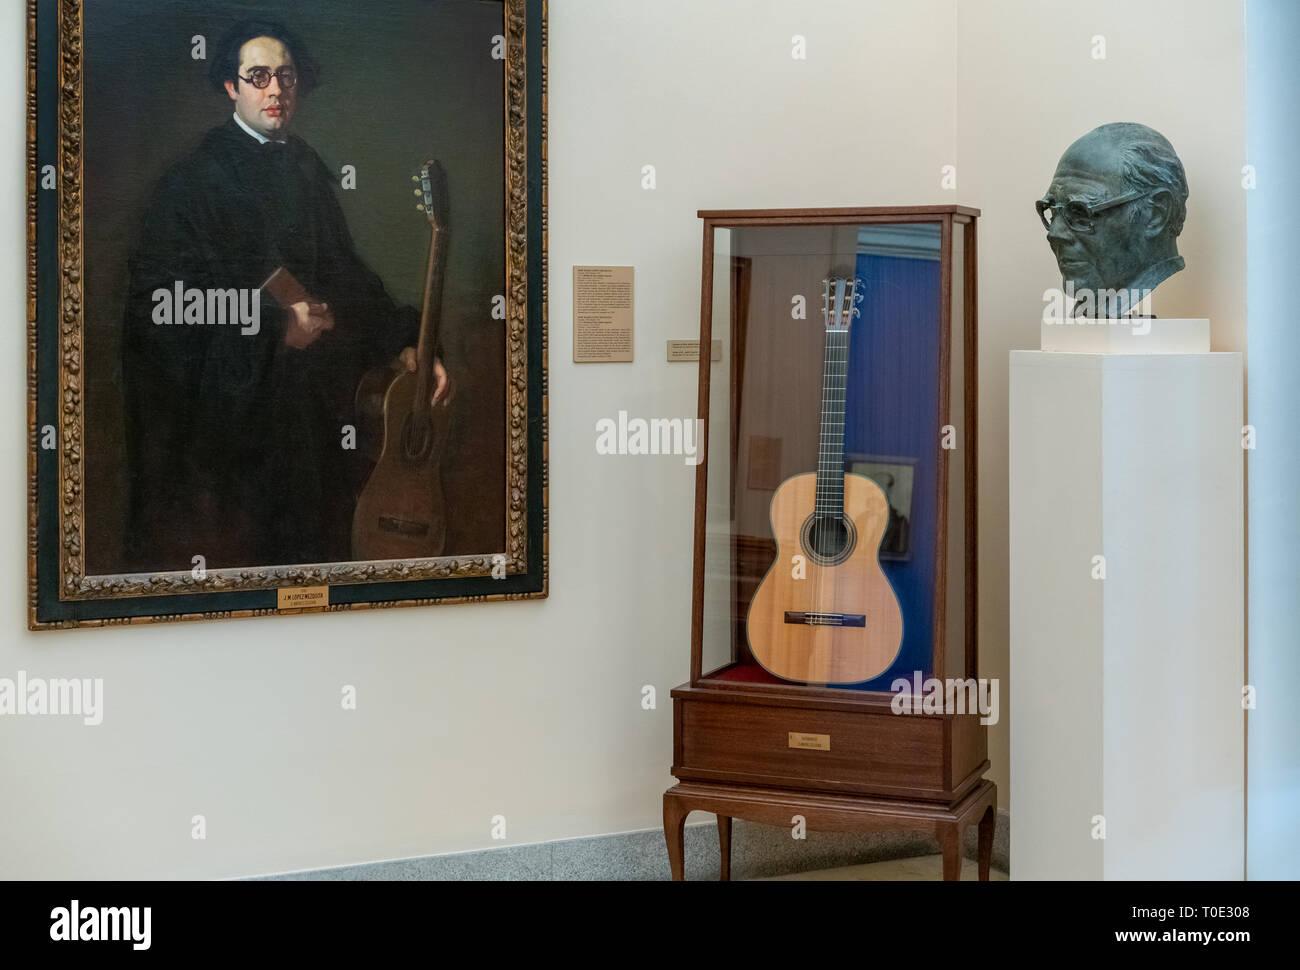 Madrid Royal Academy of Fine Arts Real Academia de Bellas Artes de San Fernando. Room dedicated to Andrés Segovia virtuoso Spanish classical guitarist - Stock Image